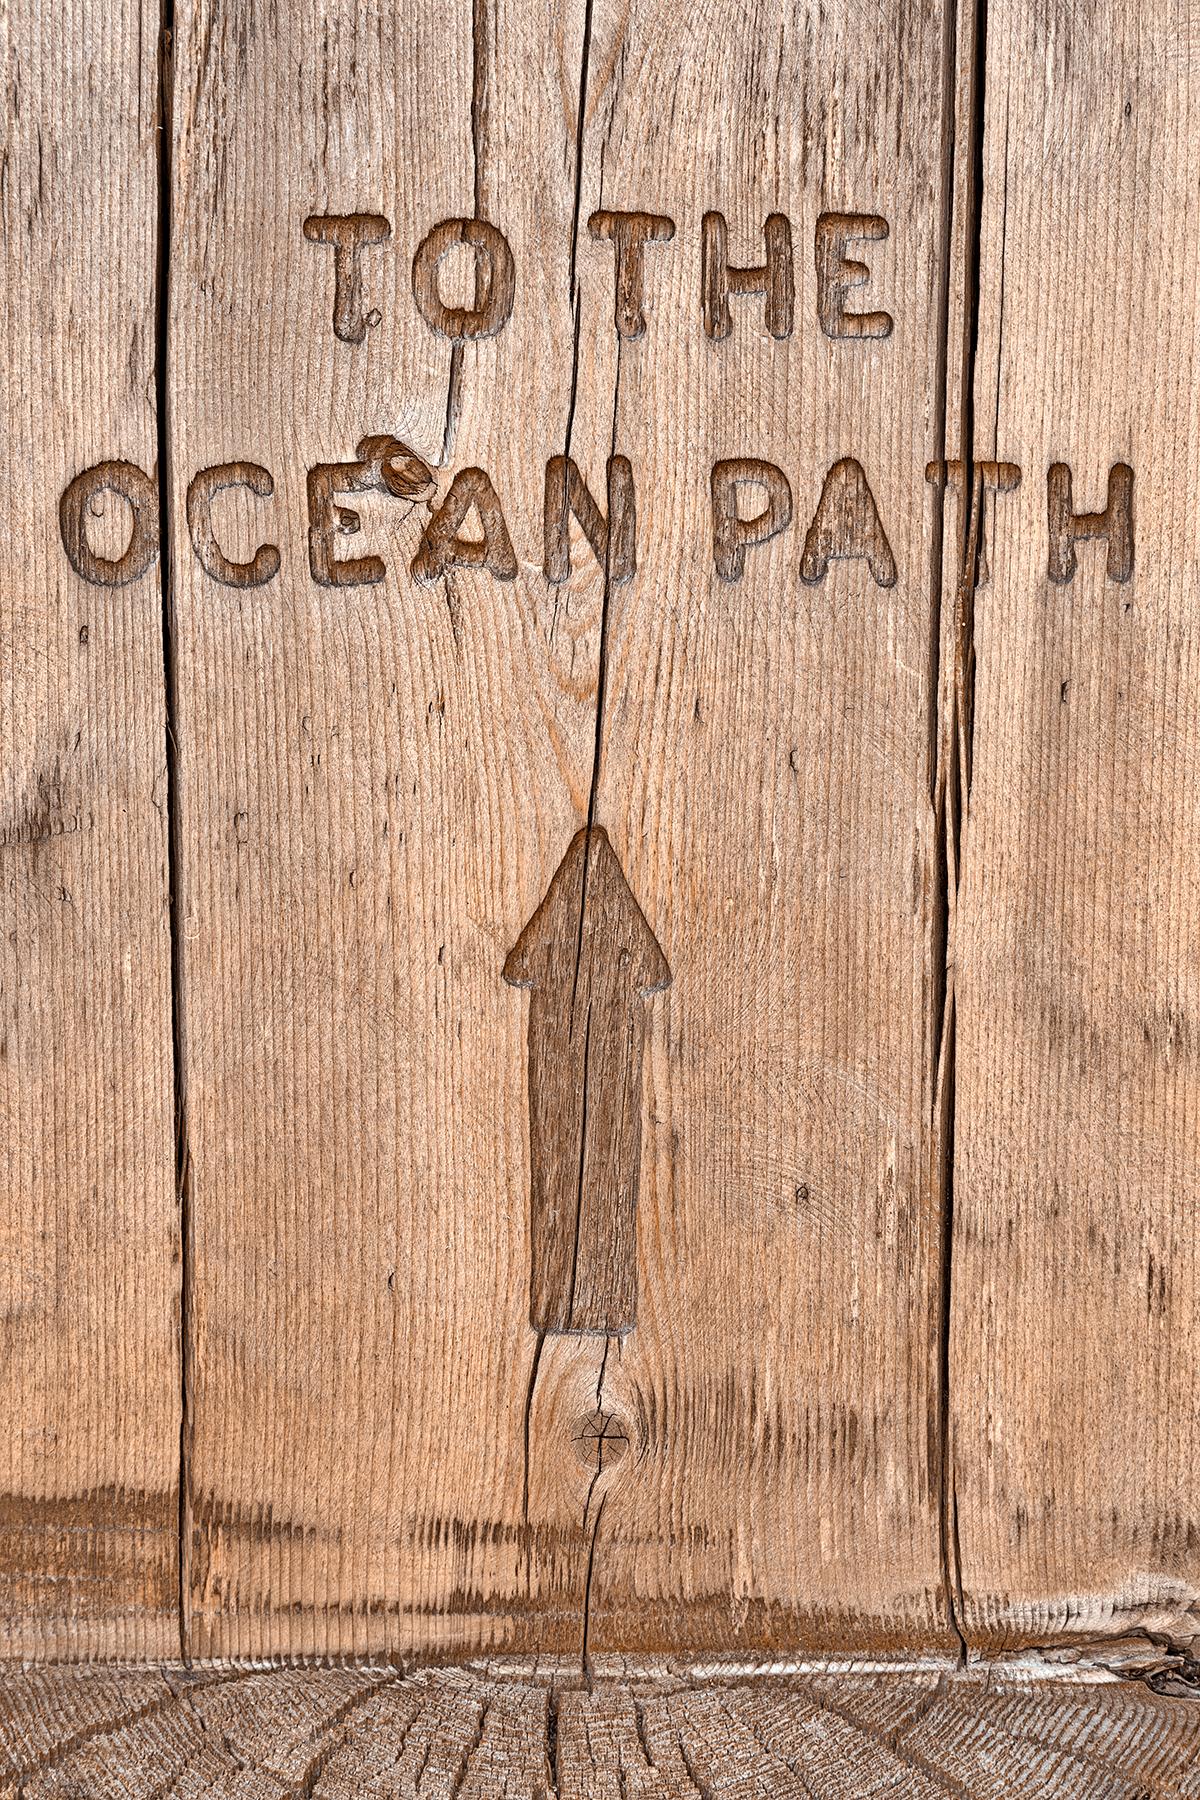 Wood Ocean Path Sign - HDR, Shadows, Shadow, Shades, Sign, HQ Photo